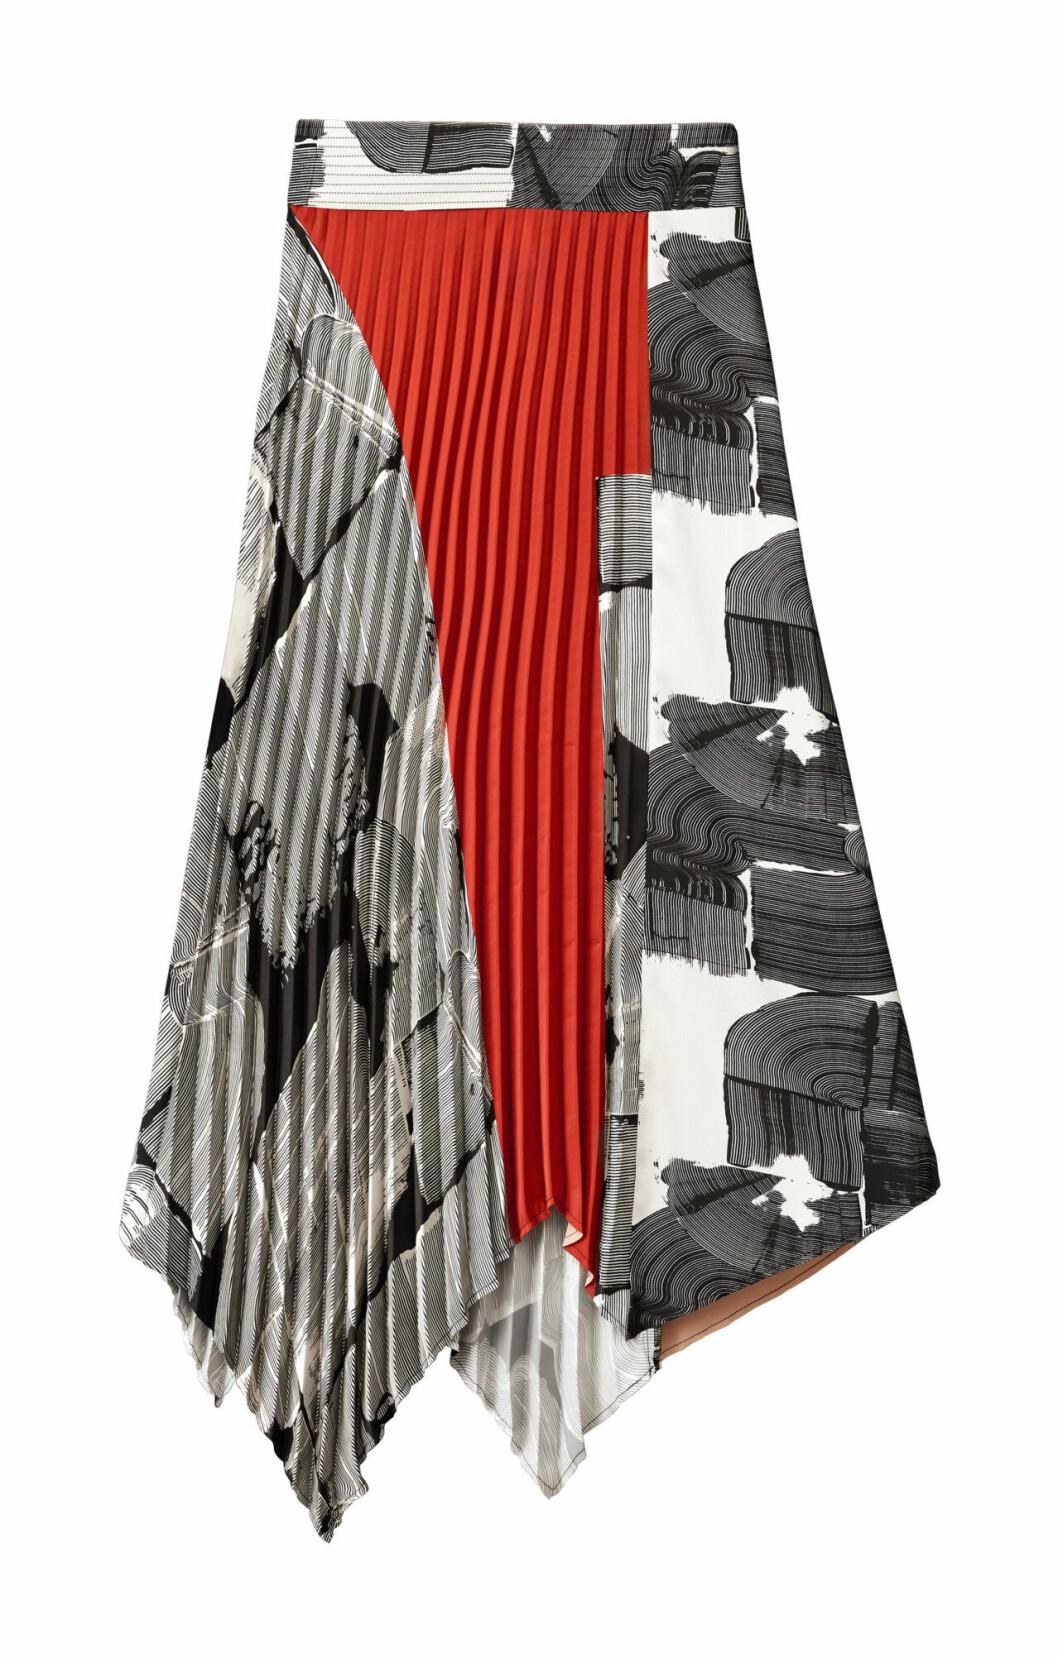 H&M Studio höstkollektion aw 2019 – plisserad kjol